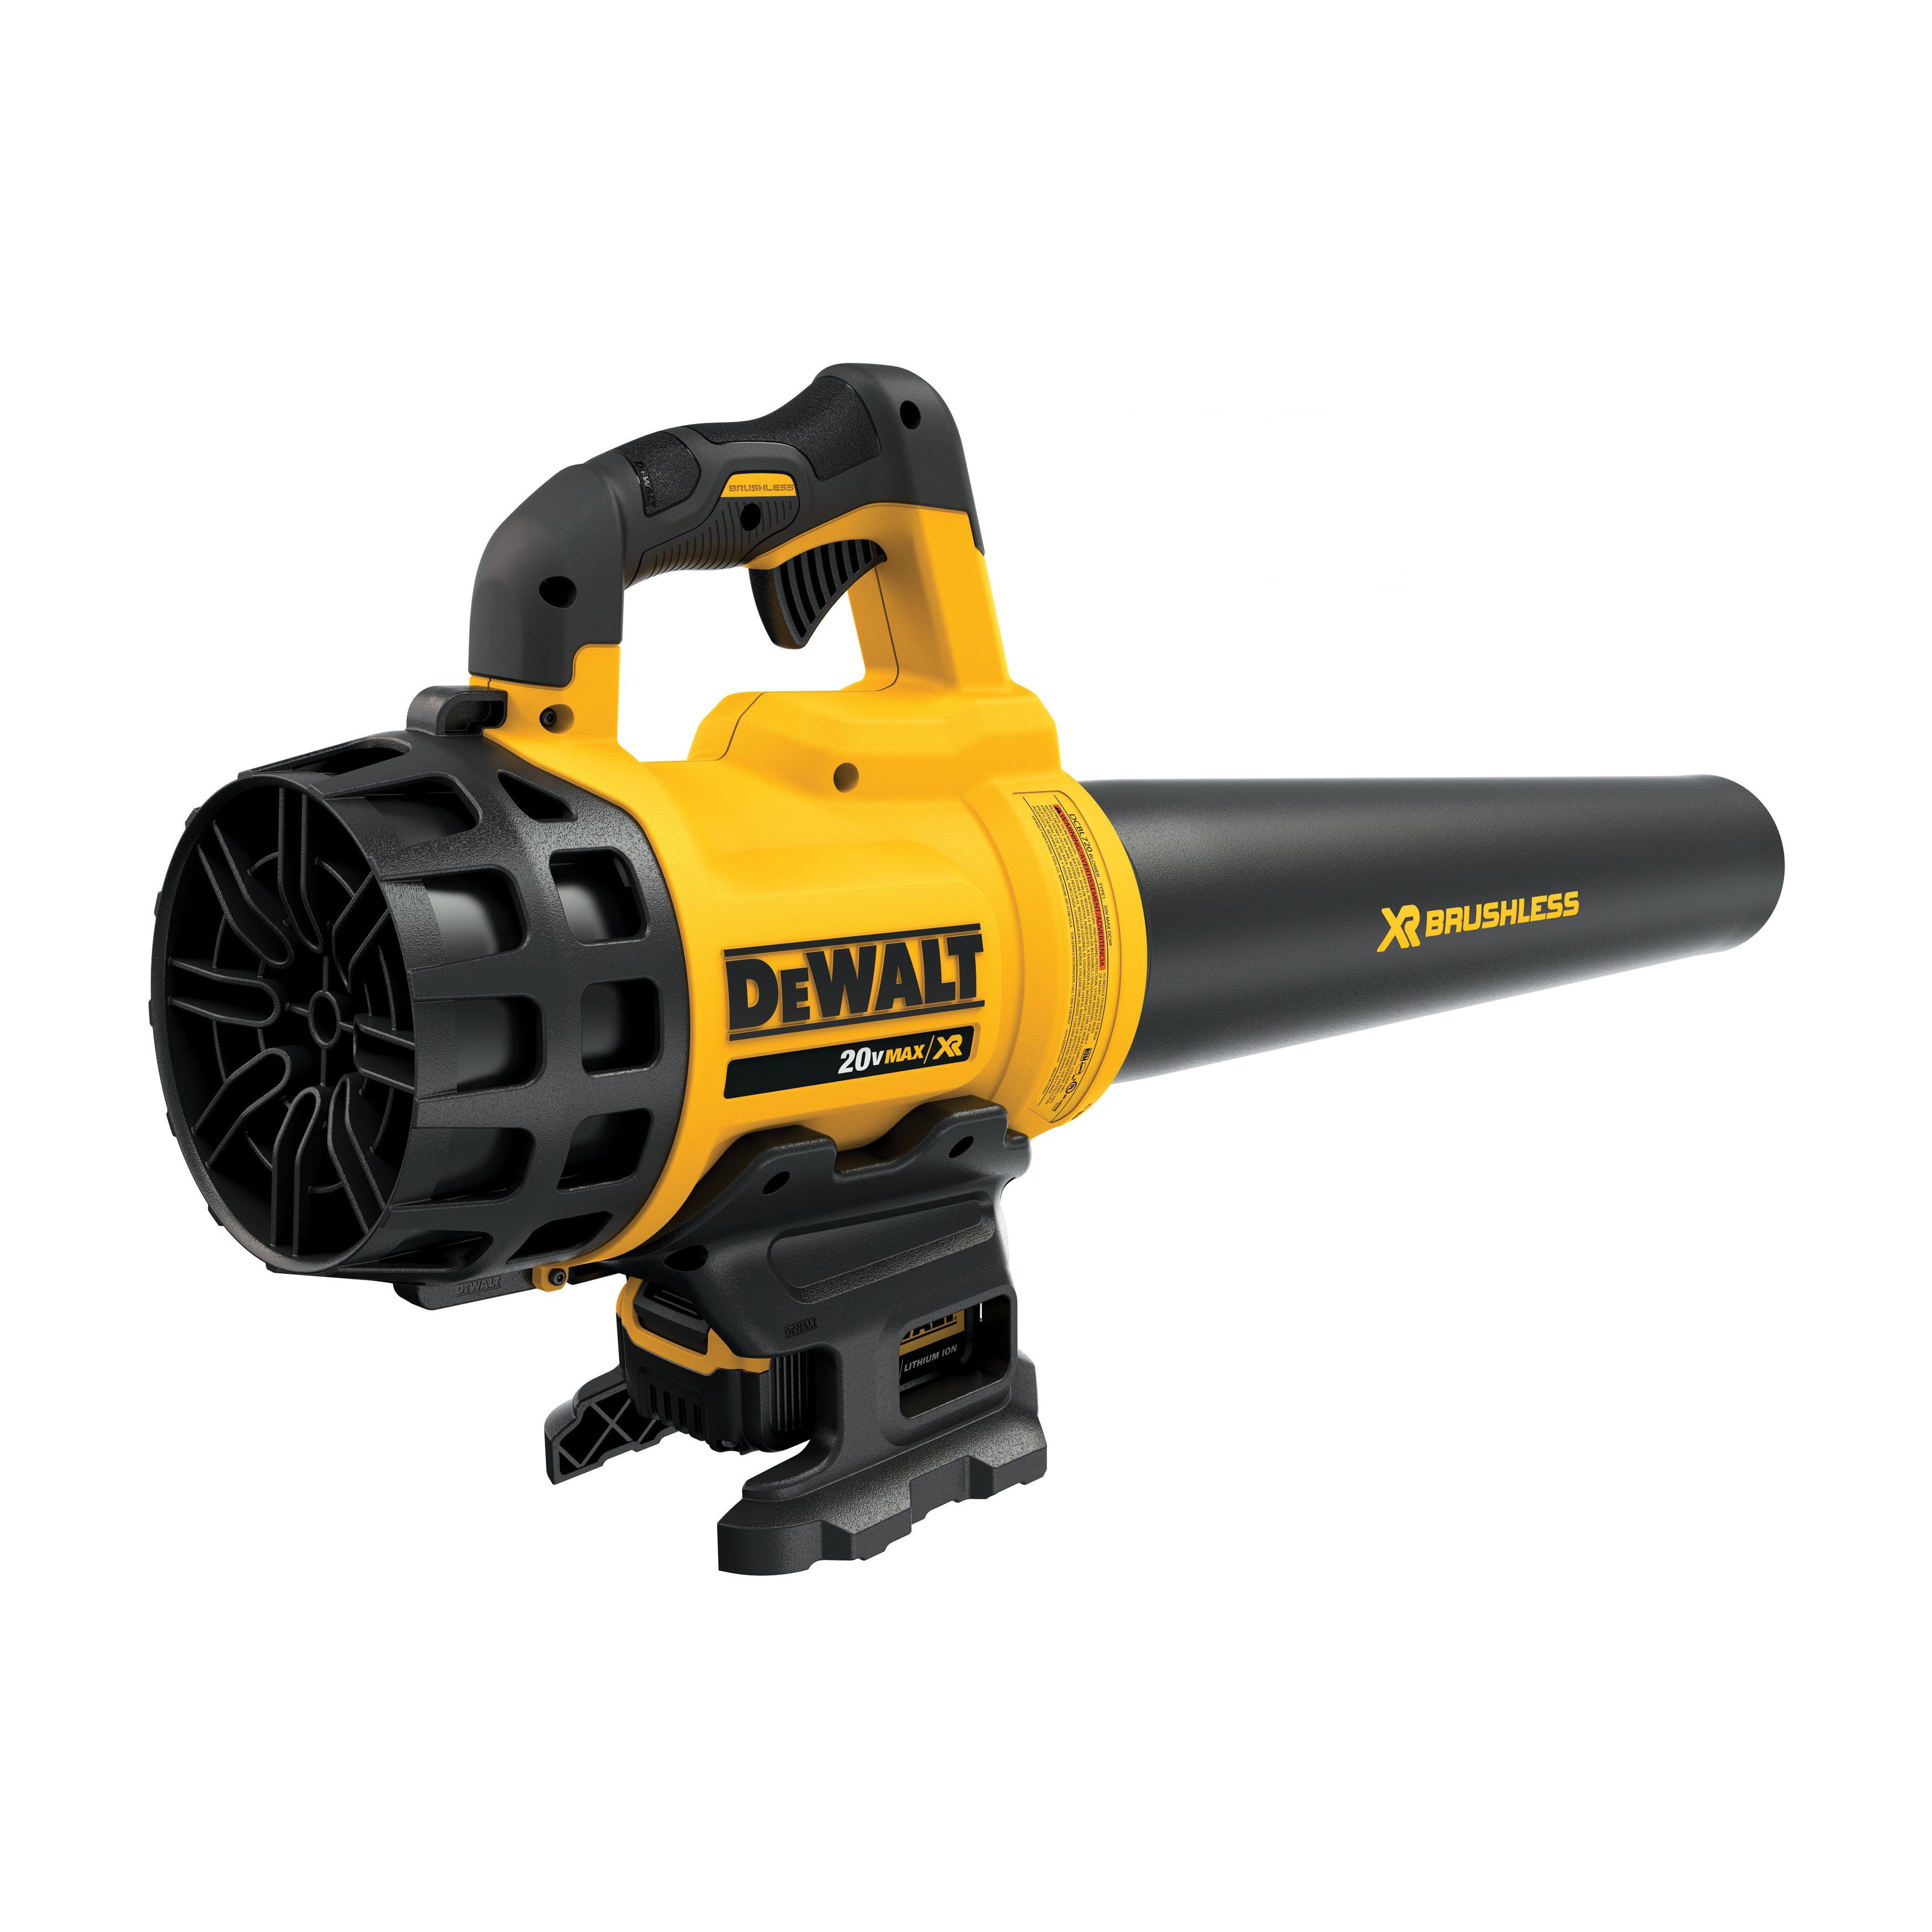 DeWALT® 20V MAX* MATRIX™ DCBL720P1 XR® Brushless Handheld Lightweight Cordless Blower Kit, 400 cfm Air Flow, 90 mph Air Velocity, 20 V 5 Ah Lithium-Ion Battery